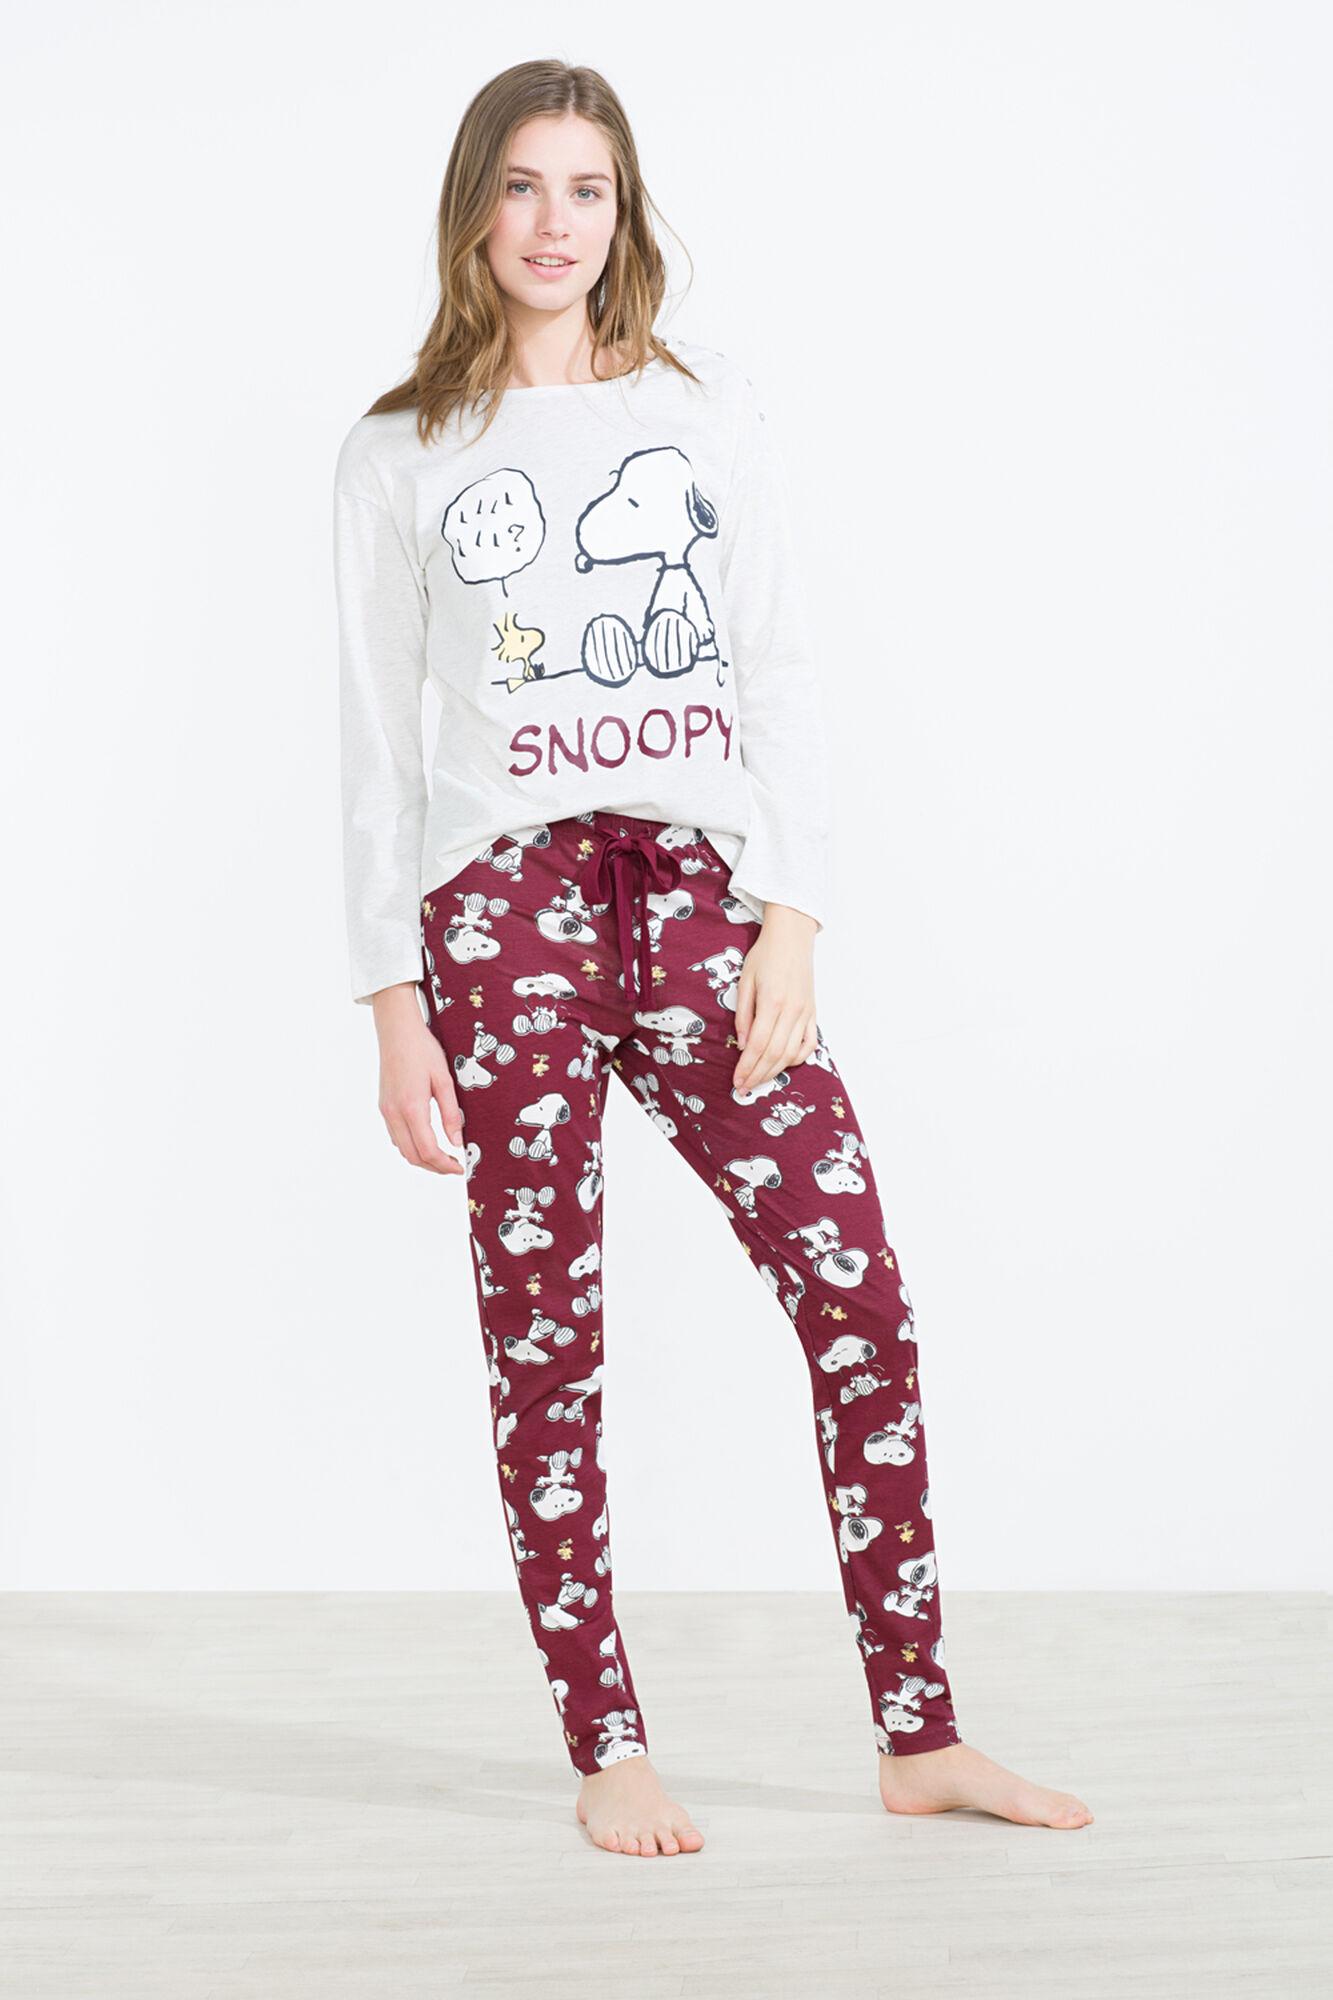 luxe recherche de véritables ventes spéciales Long cotton Snoopy & Woodstock pyjama | Temp anteriores | Women'secret